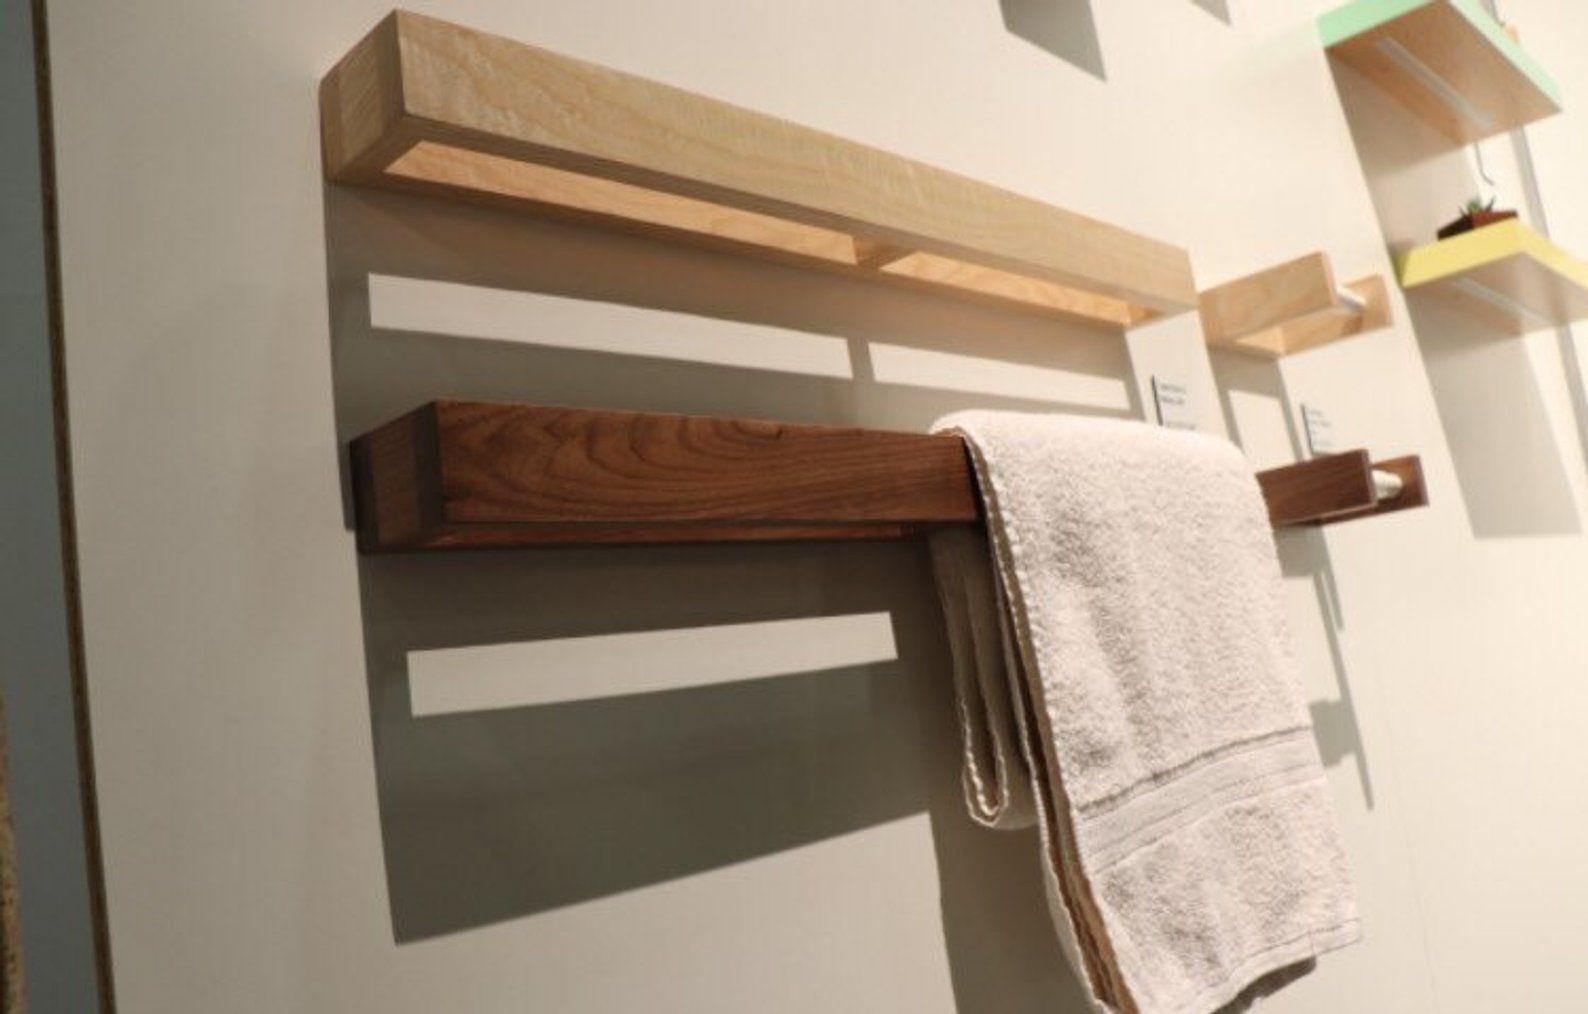 Handtuch Rack Nussbaum Moderne Handtuch Bar Wand Rack